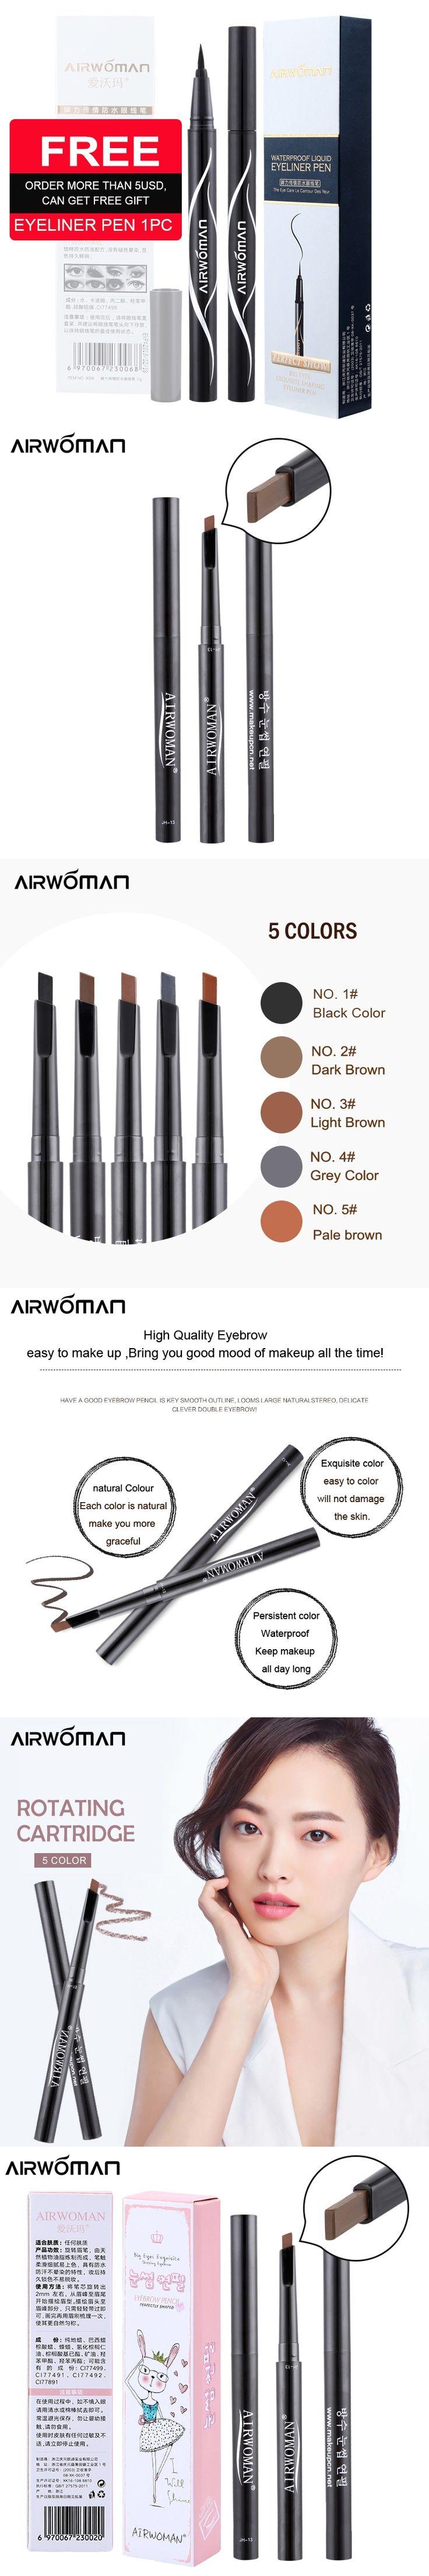 Brand 1 PC 5 Color Women Lady Triangle Waterproof Eyebrow Pencil New automatic Eye Brow Pen cosmetic makeup maquiagem eyebrow